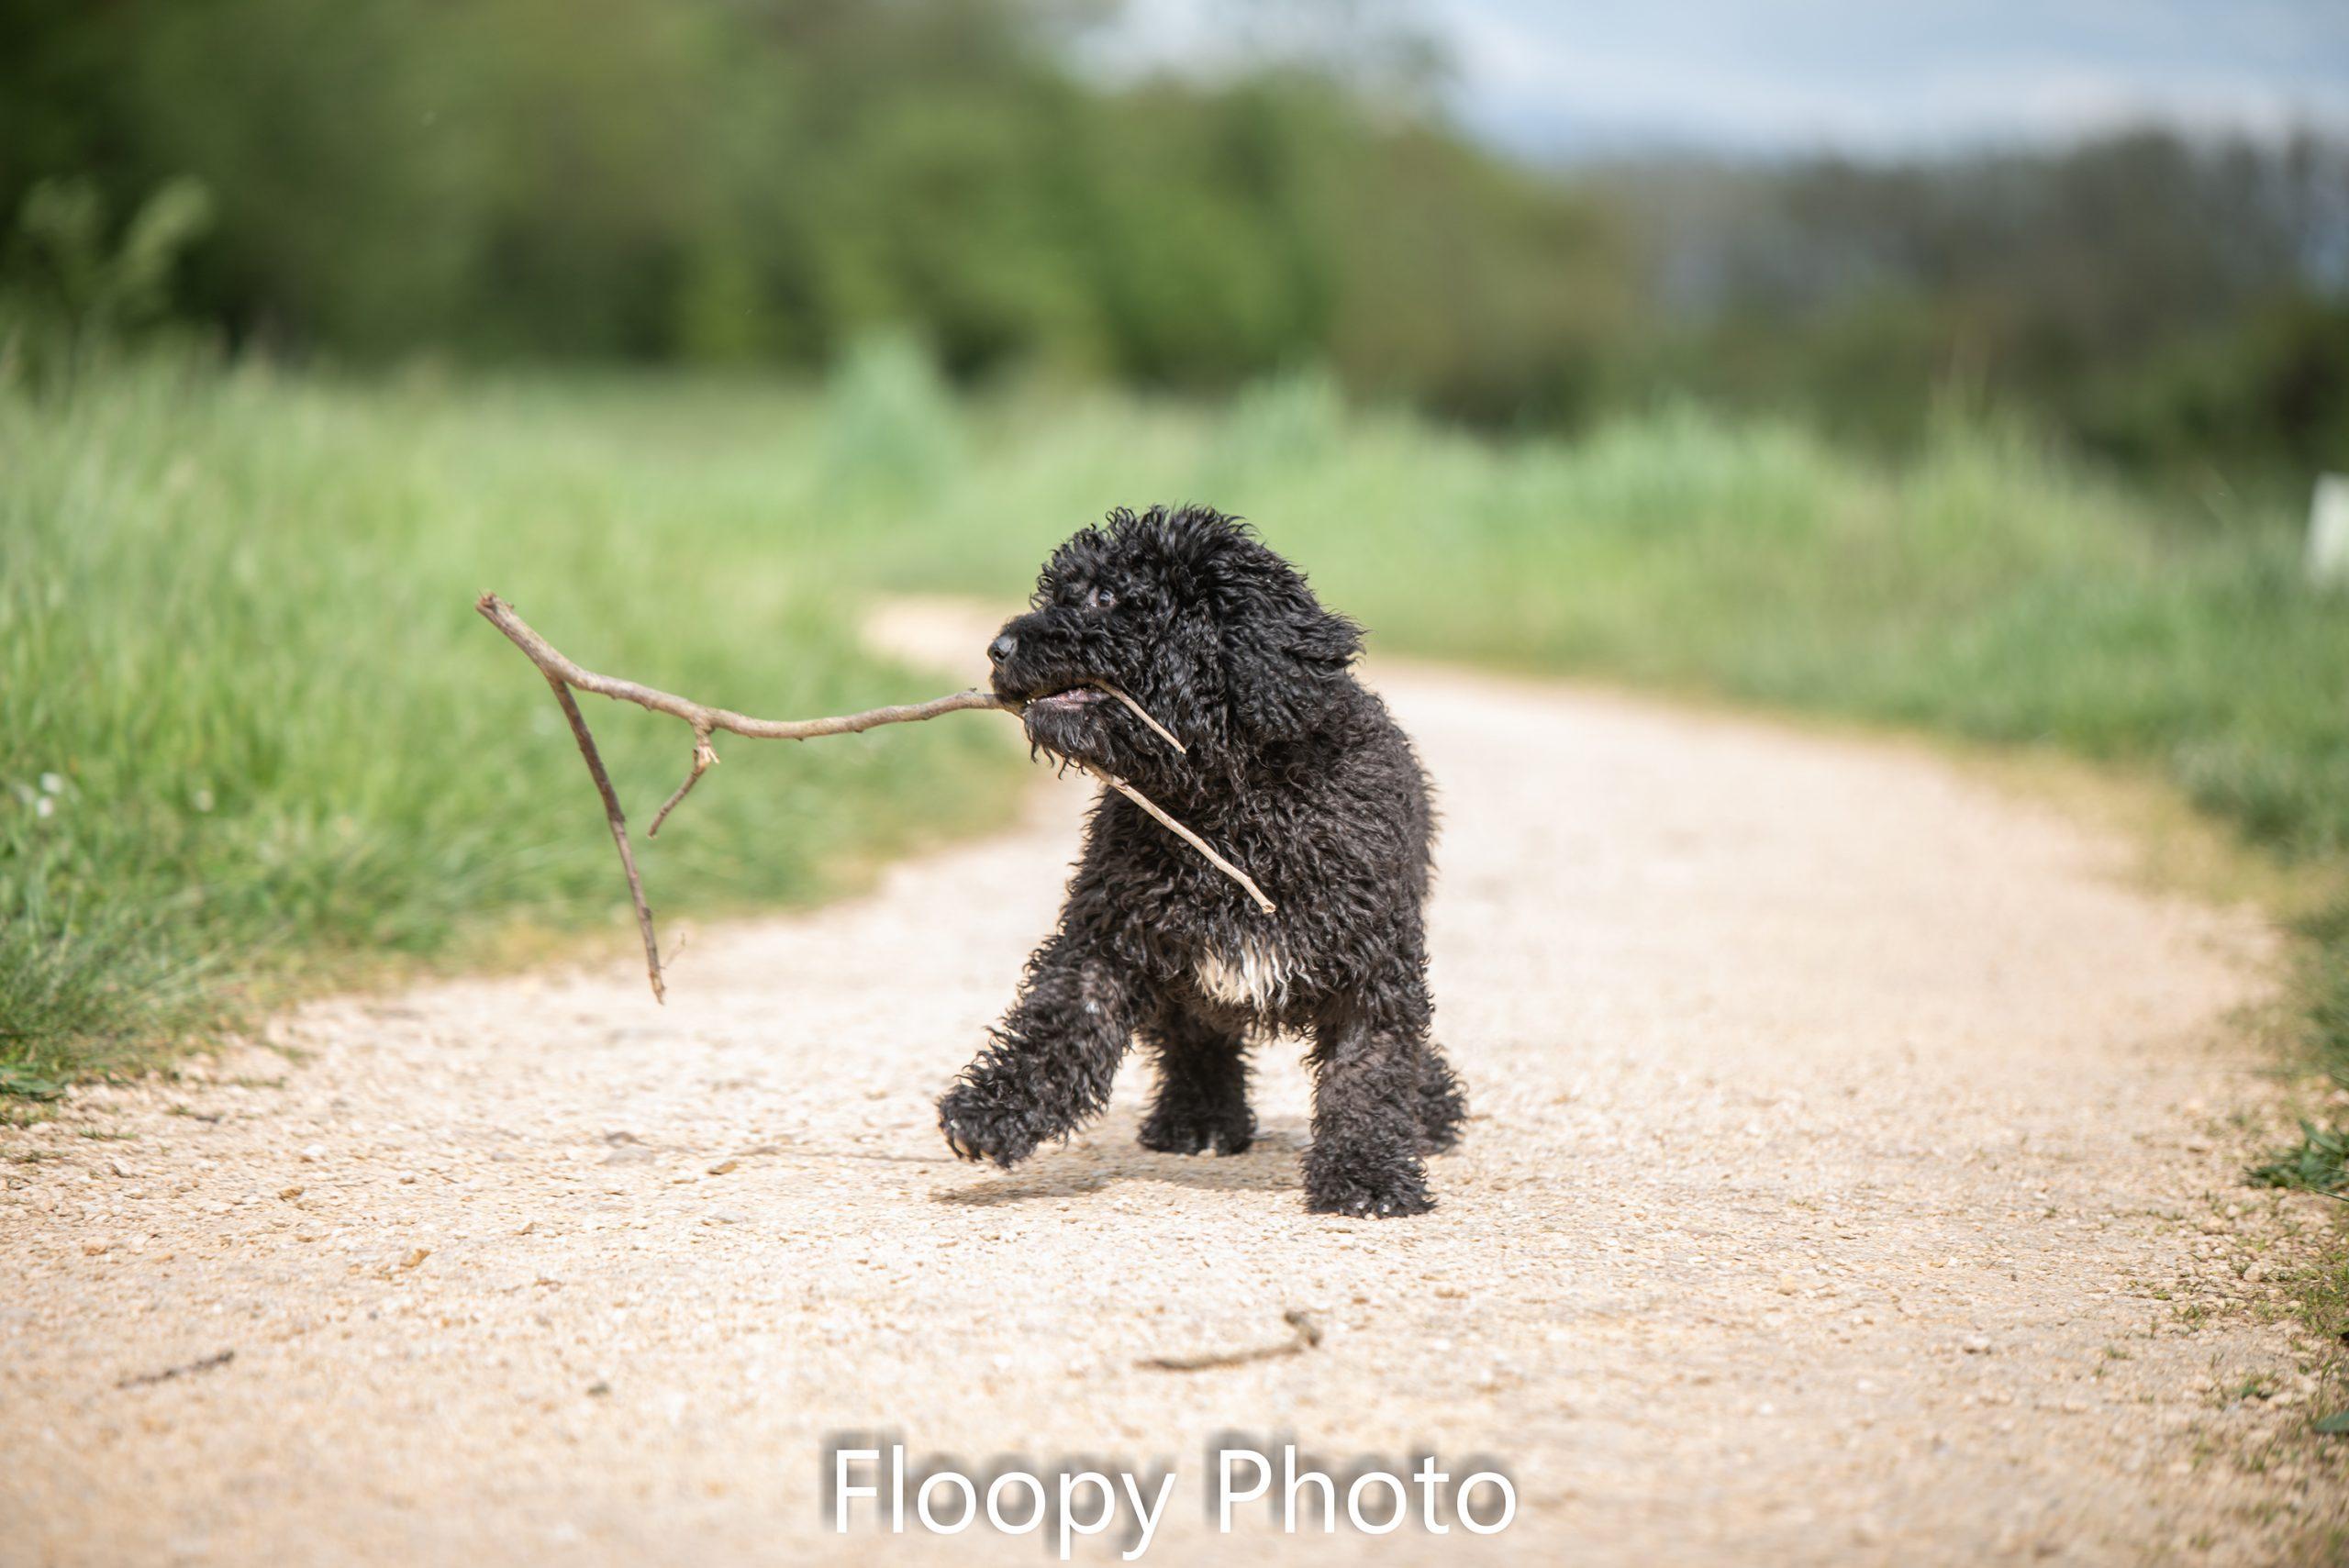 Floopy Photo-5196